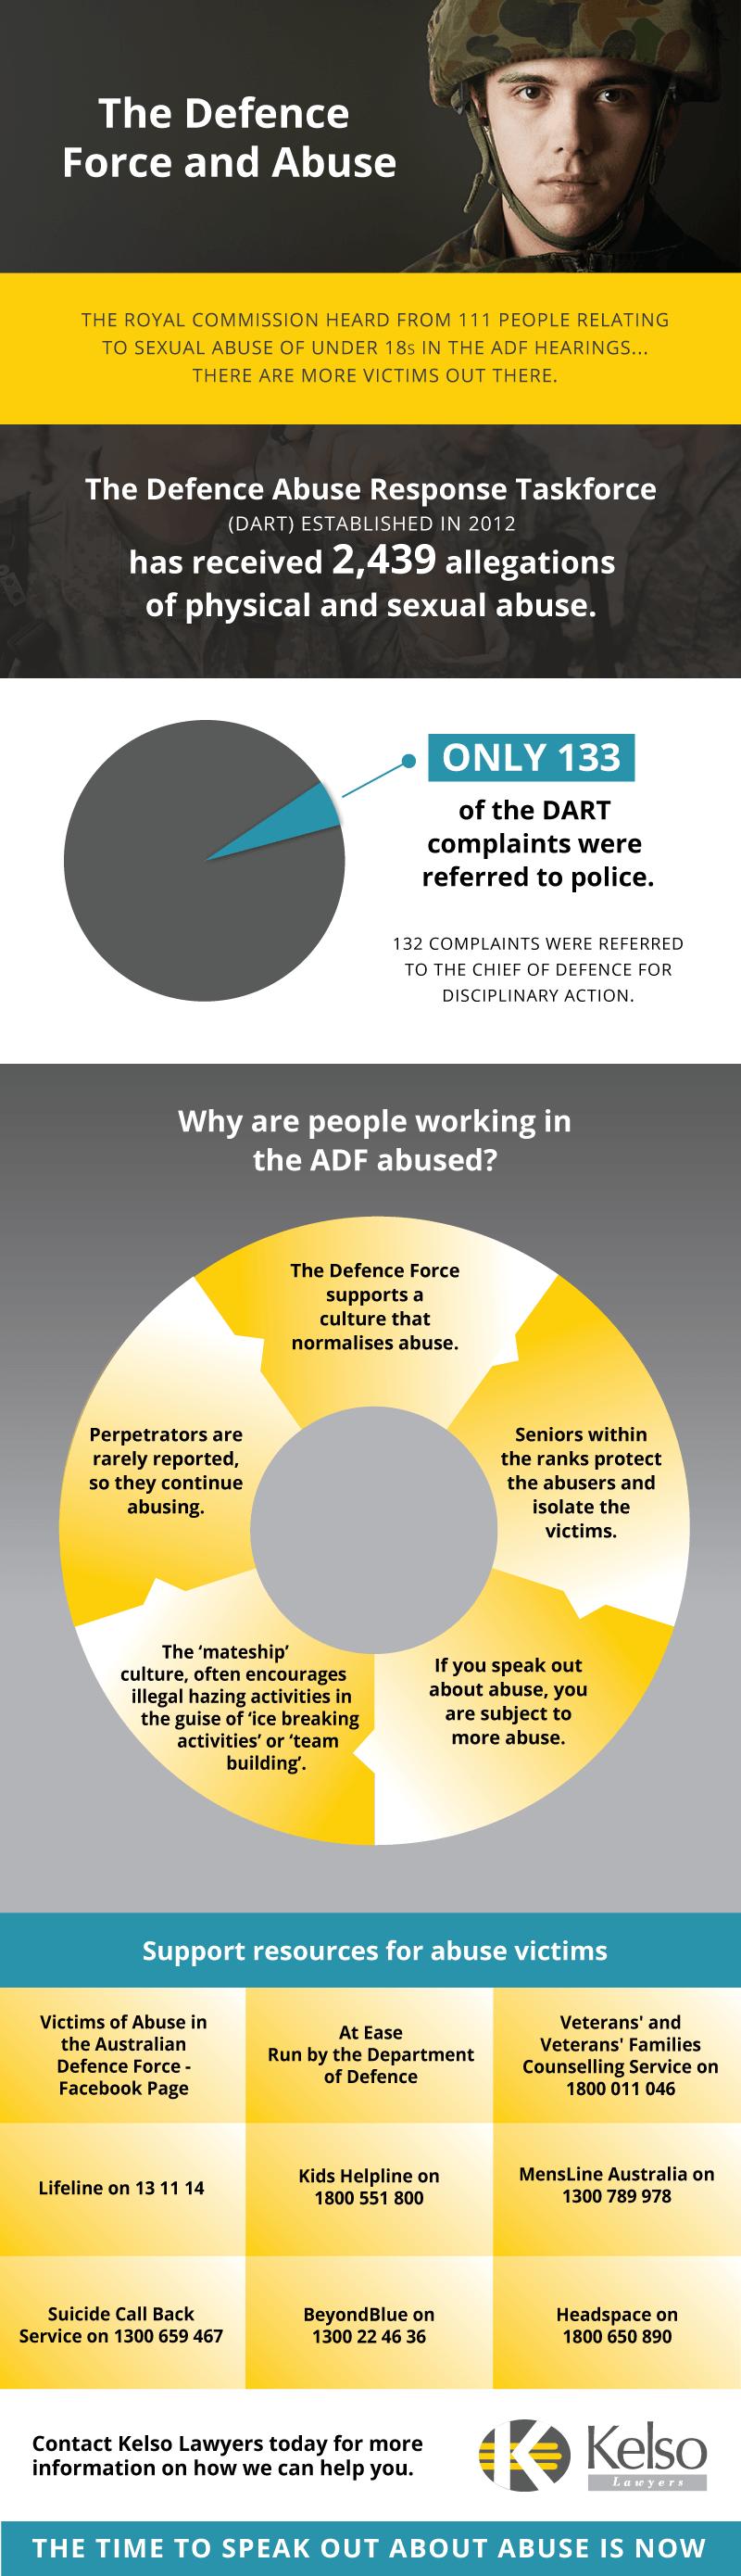 ADF-abuse-statistics-kelso